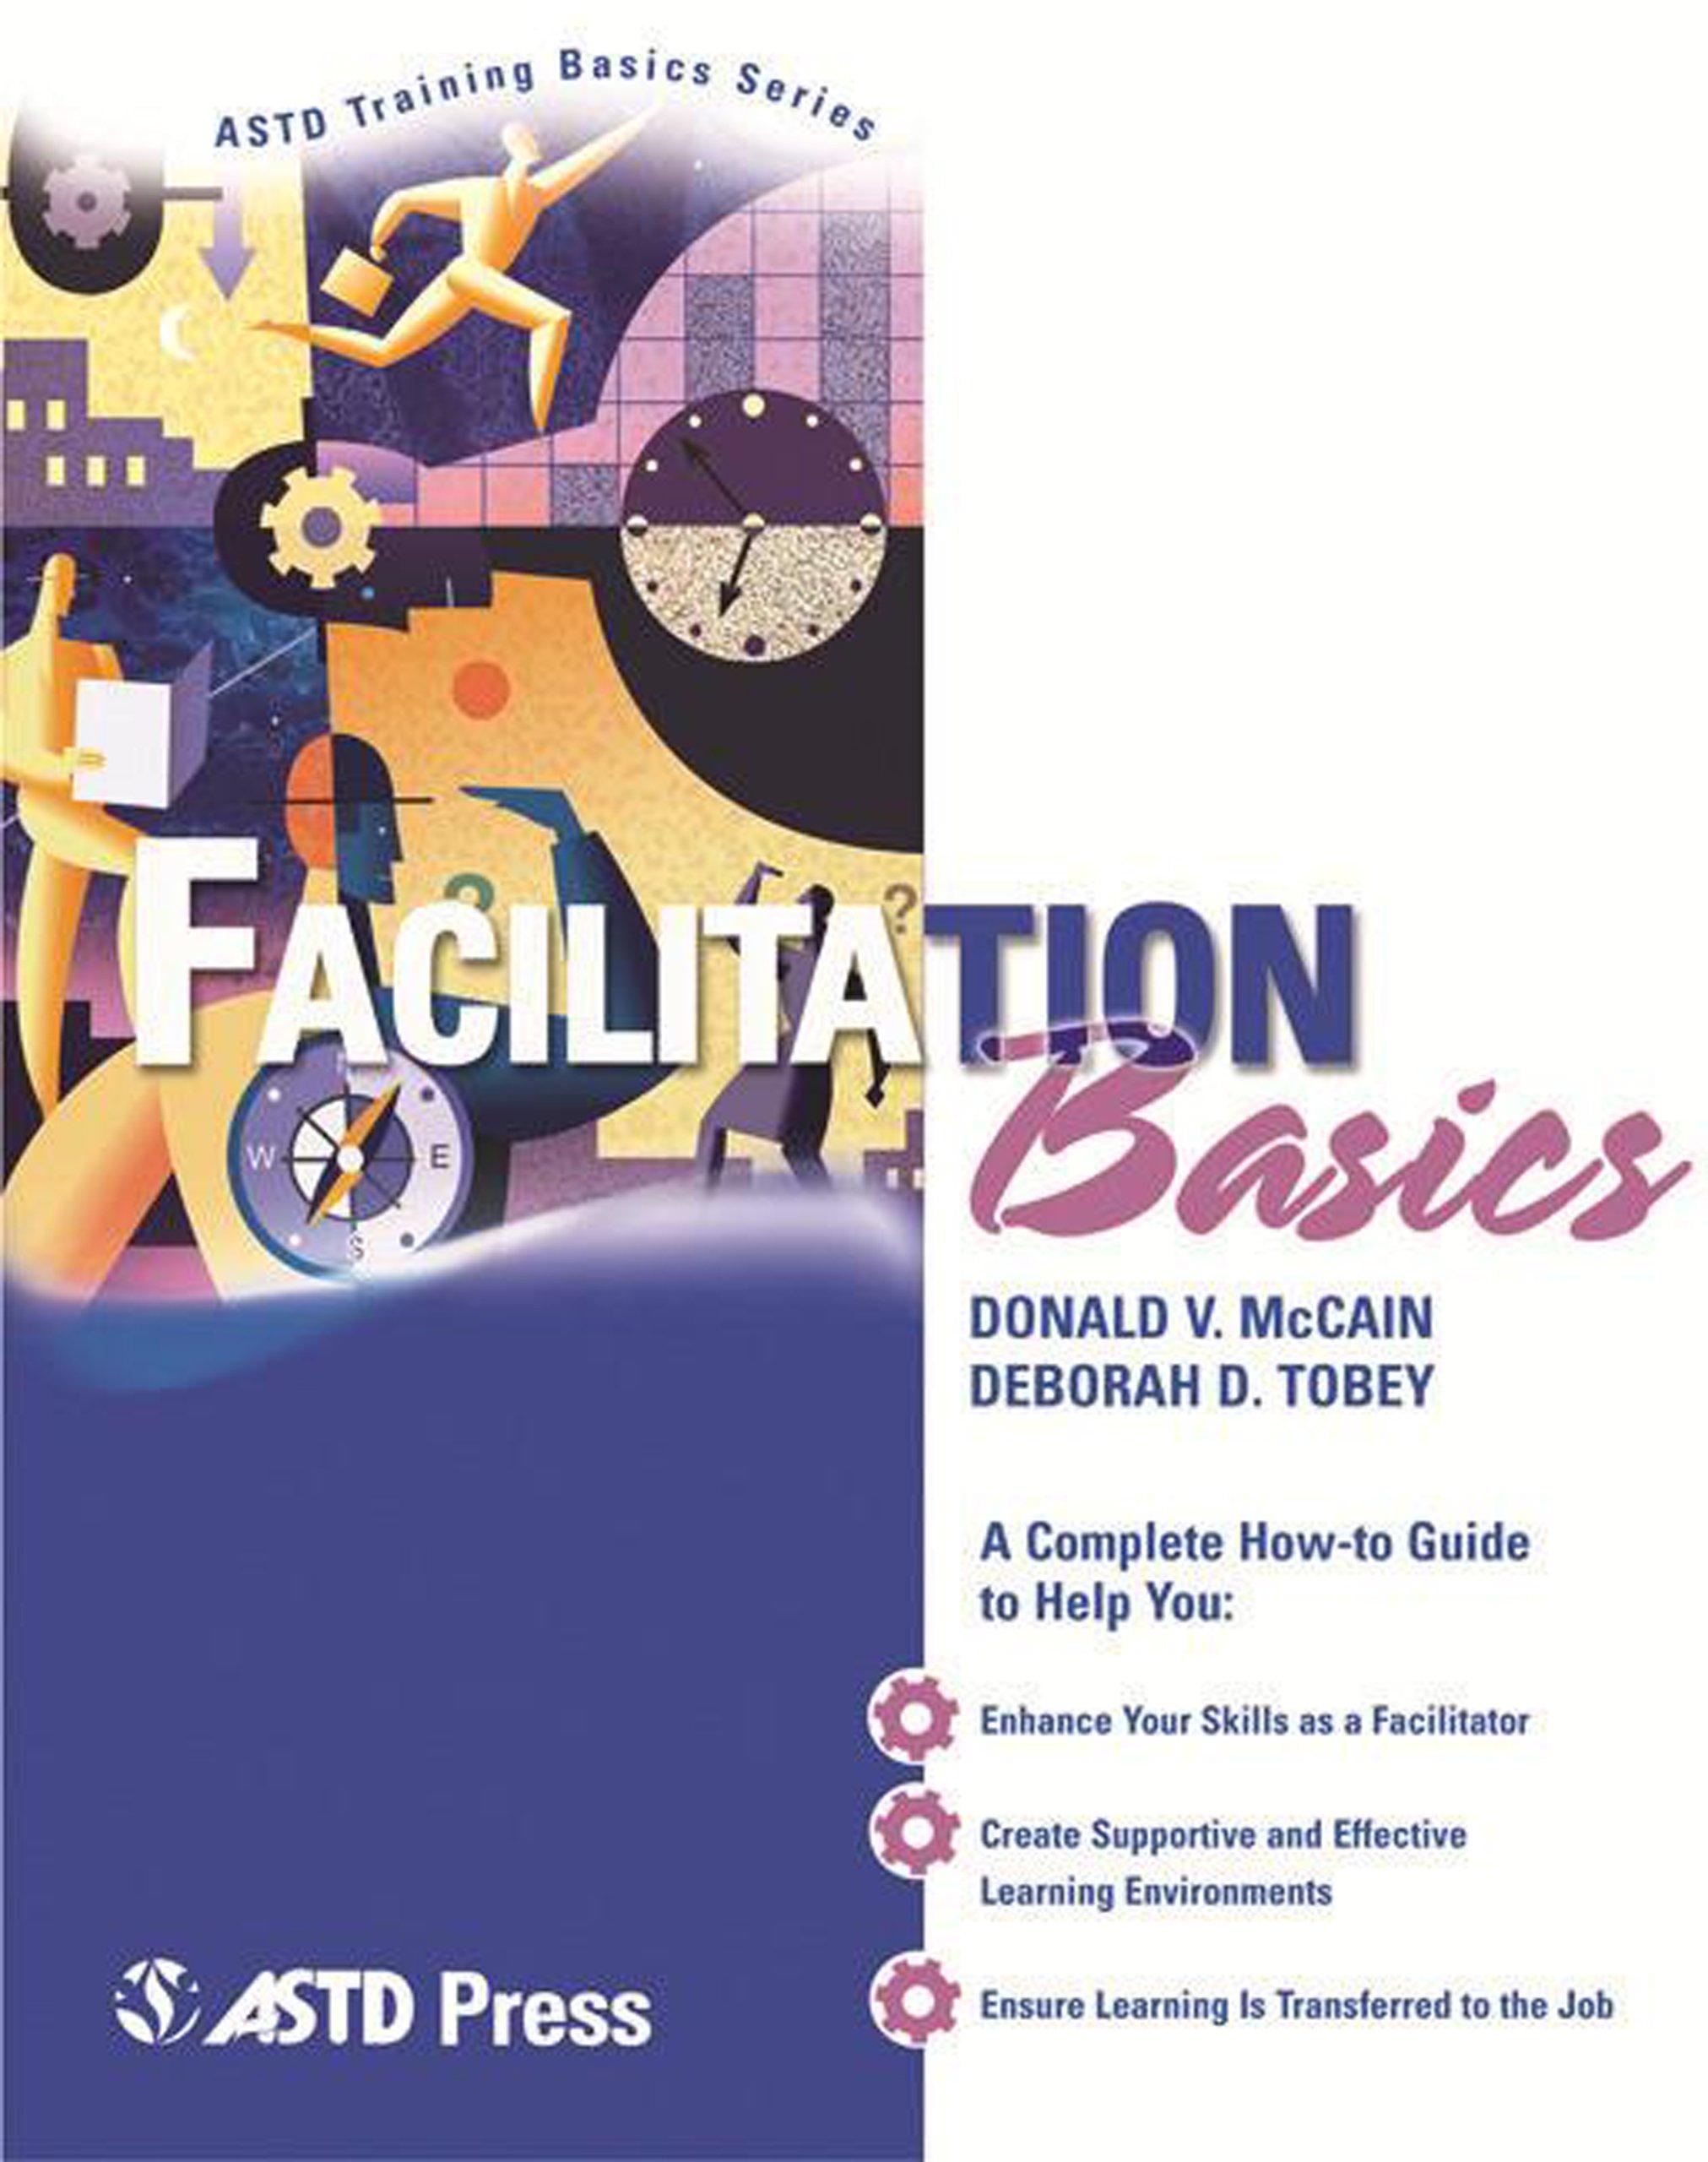 Facilitation Basics (ASTD Training Basics): Donald V. McCain, Deborah D.  Tobey: 9781562863616: Amazon.com: Books